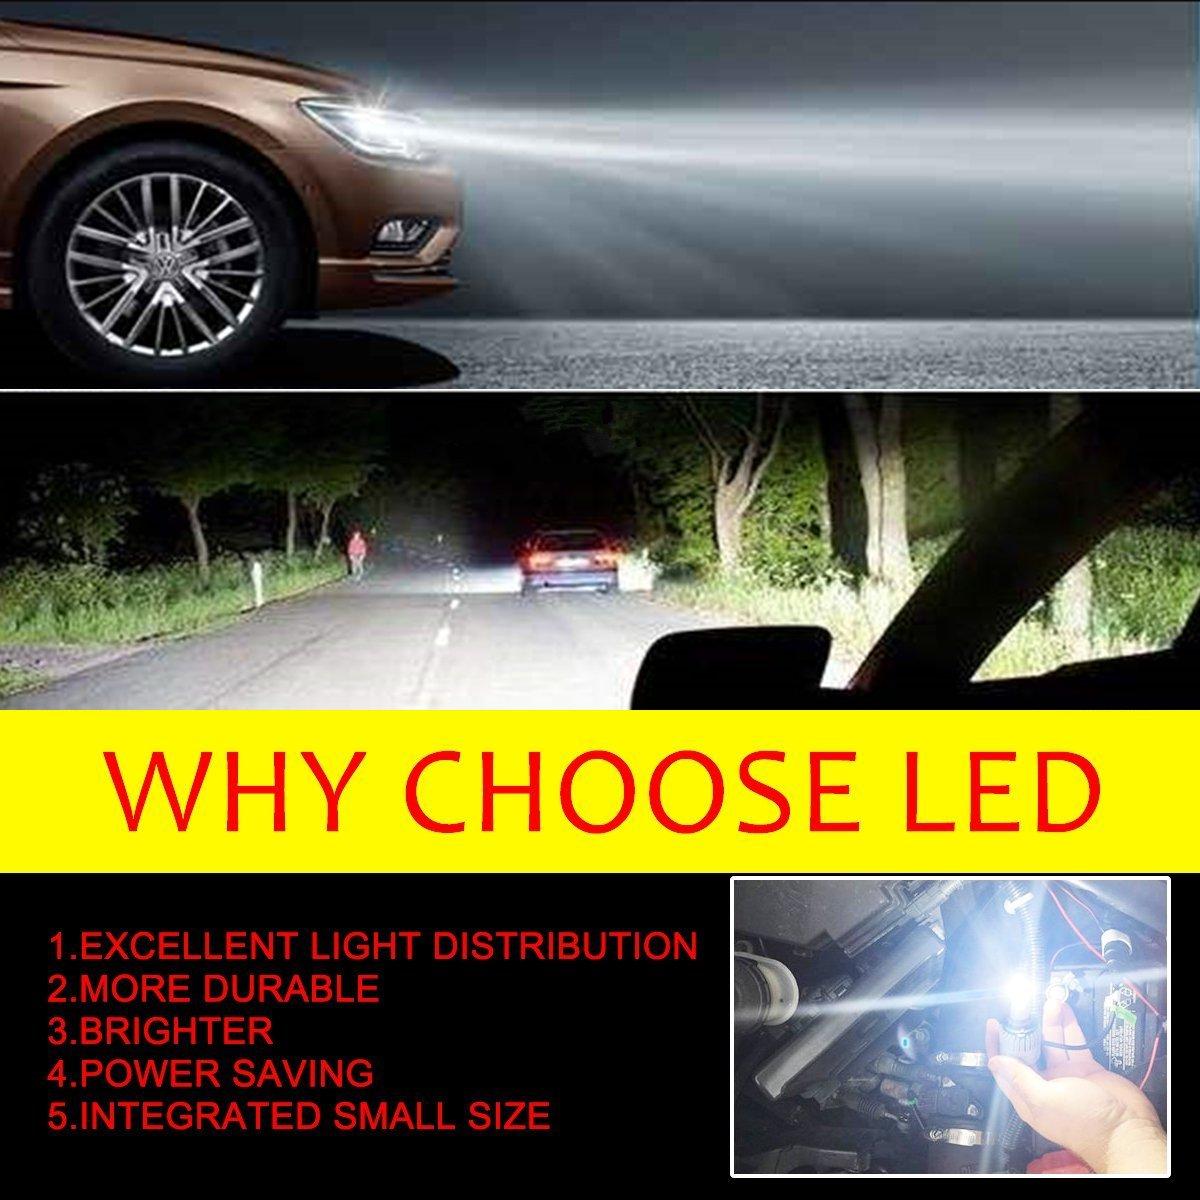 Amazon.com: H7 LED Headlight Bulbs, SWATOW INDUSTRIES H7 Headlight Kits Osram COB 10,000lm 6000K Cool White 2PCS - 2 Year Warranty: Automotive